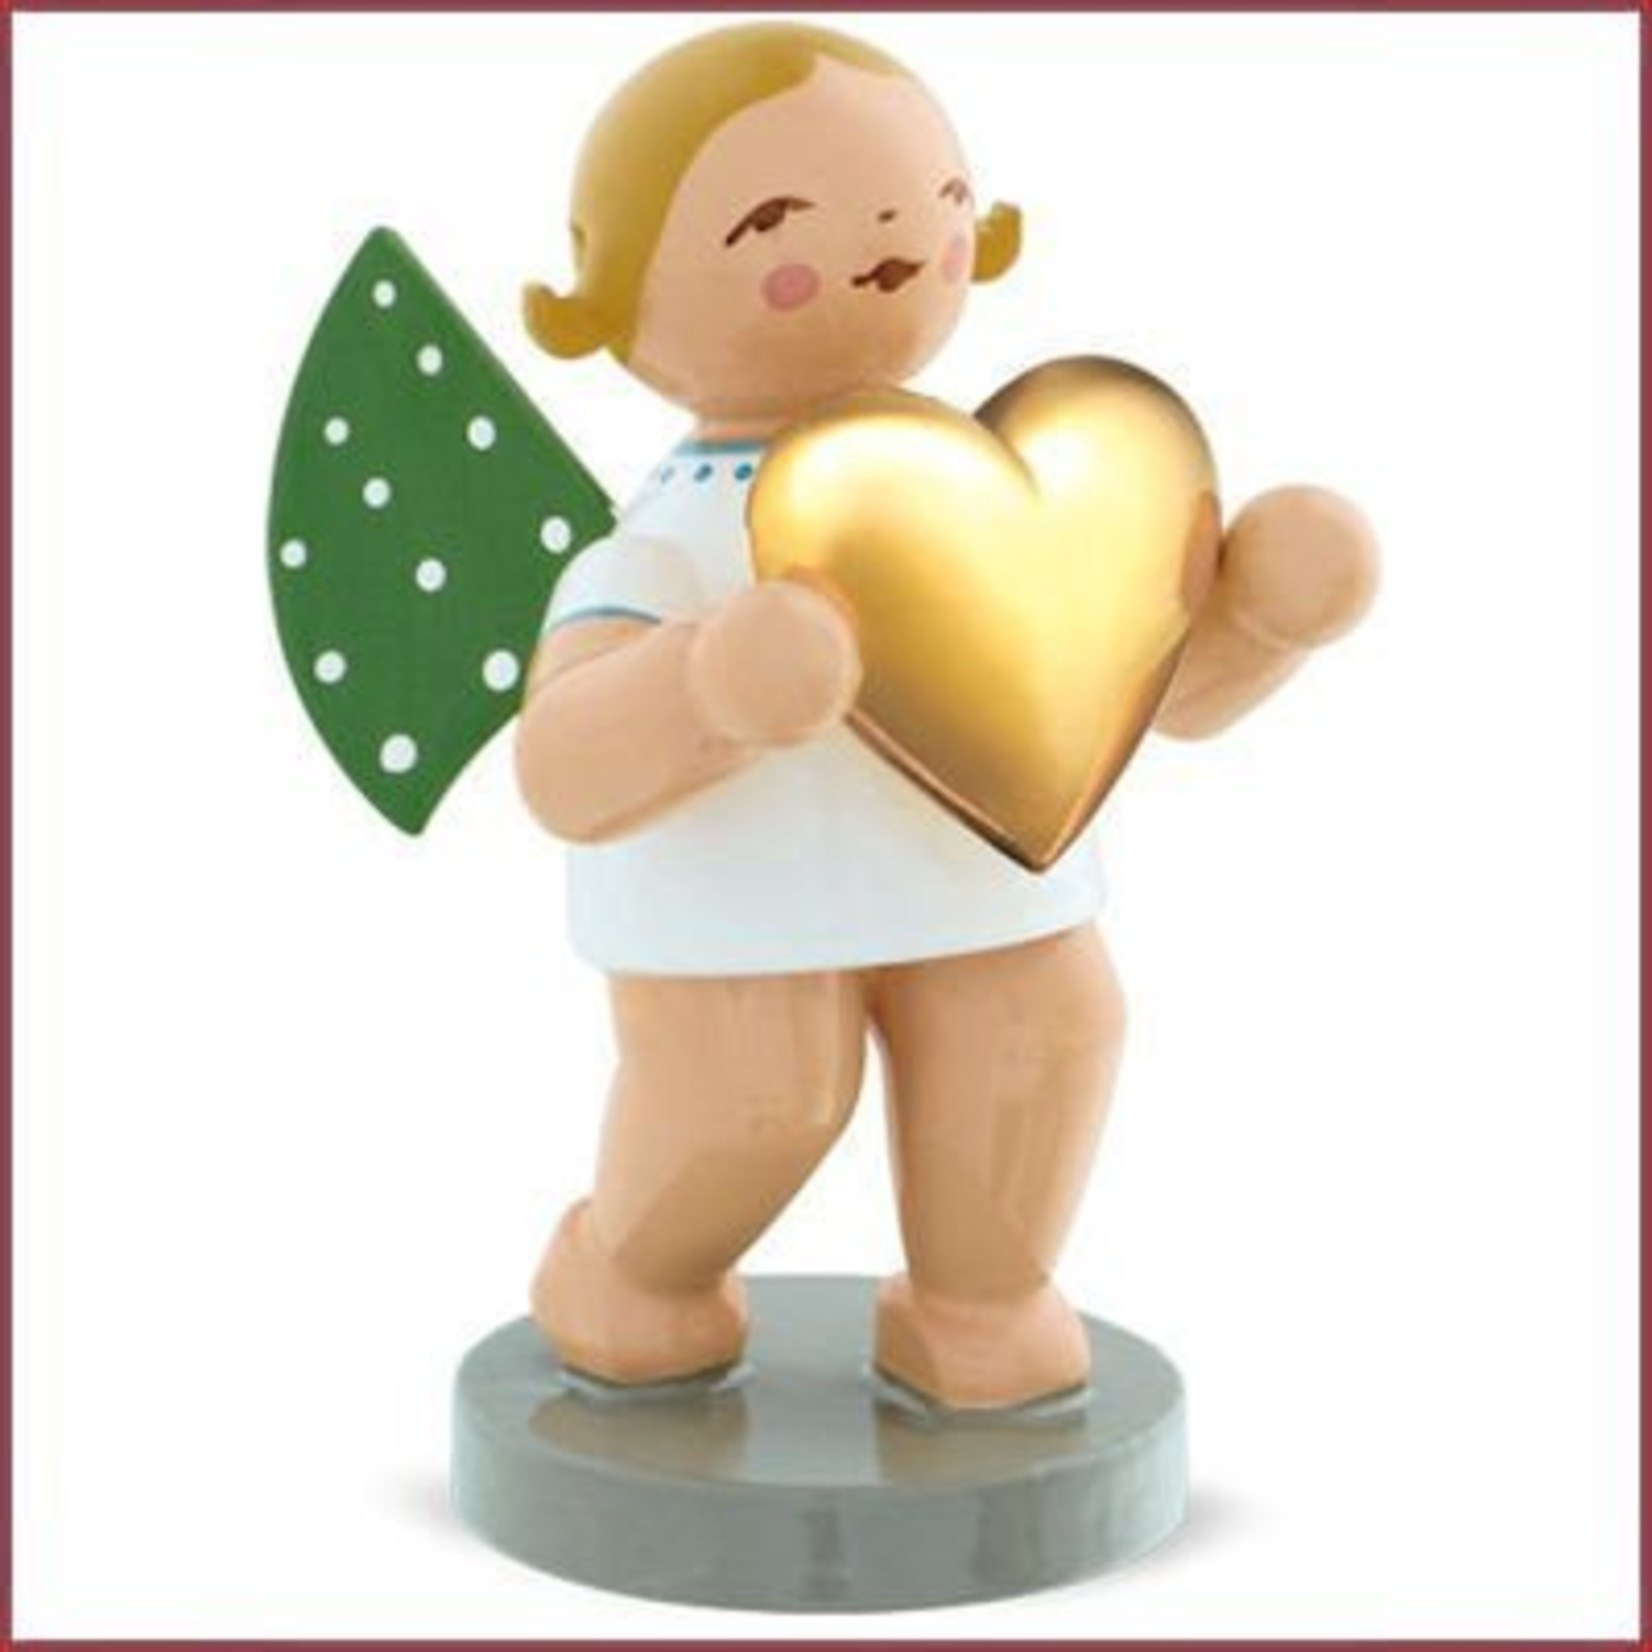 Wendt & Kühn Gold Edition - Grunhainichense Liefdesengel met verguld hart